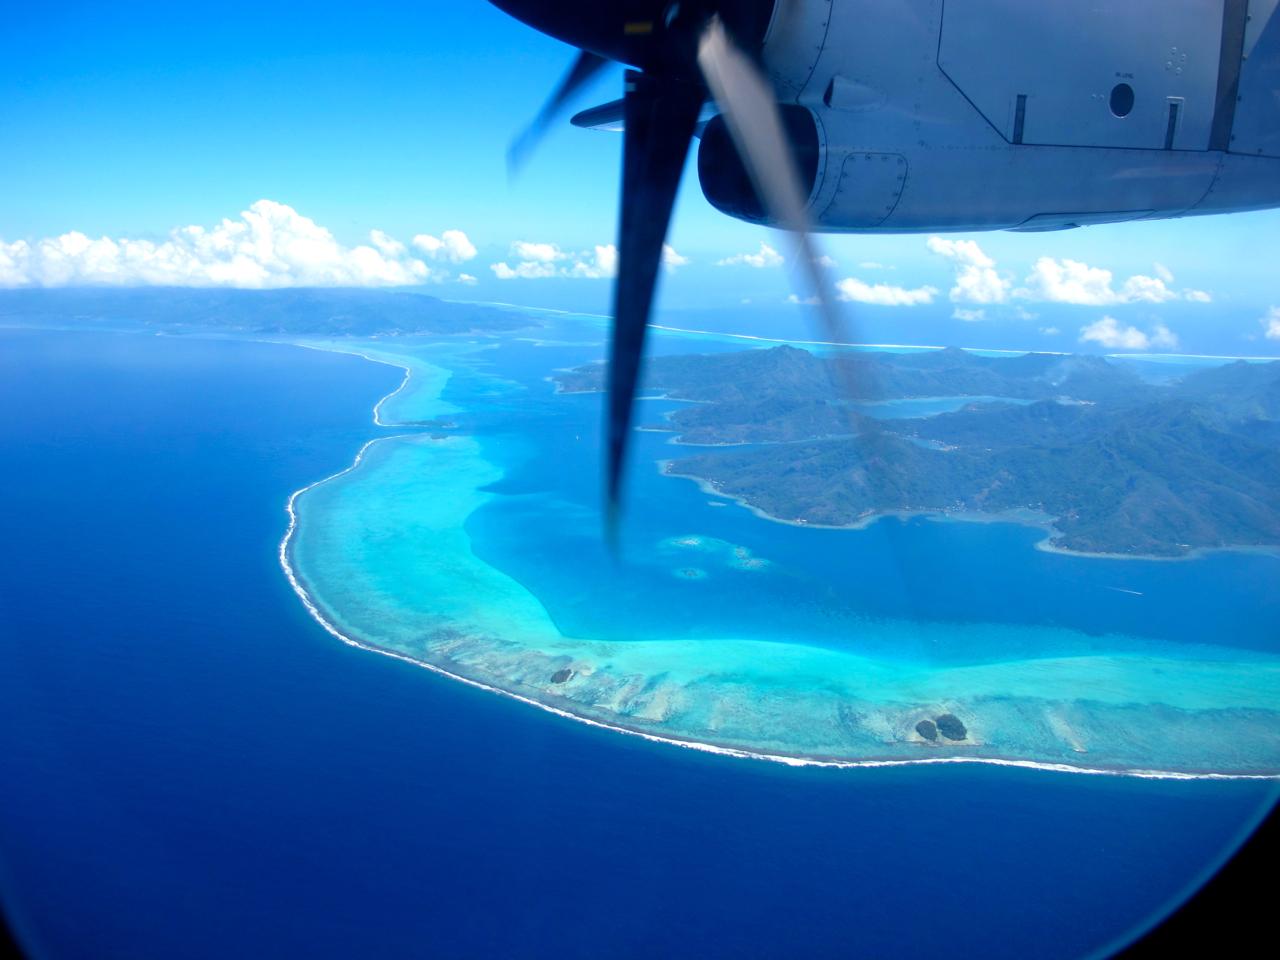 Bora Bora 3 aerial photograph